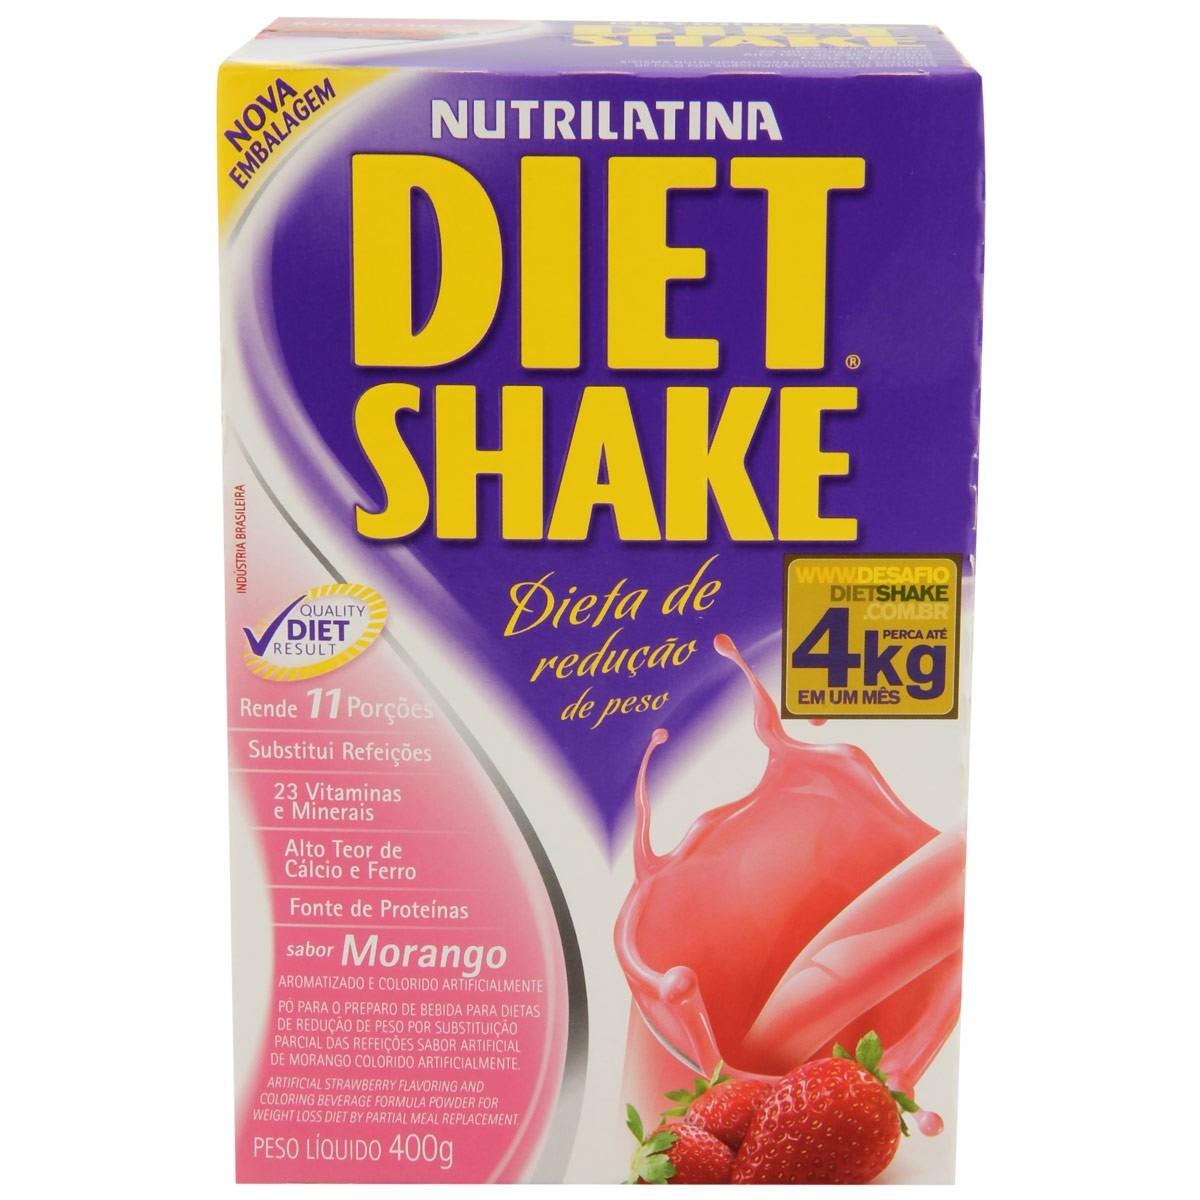 Diet Shake de Morango